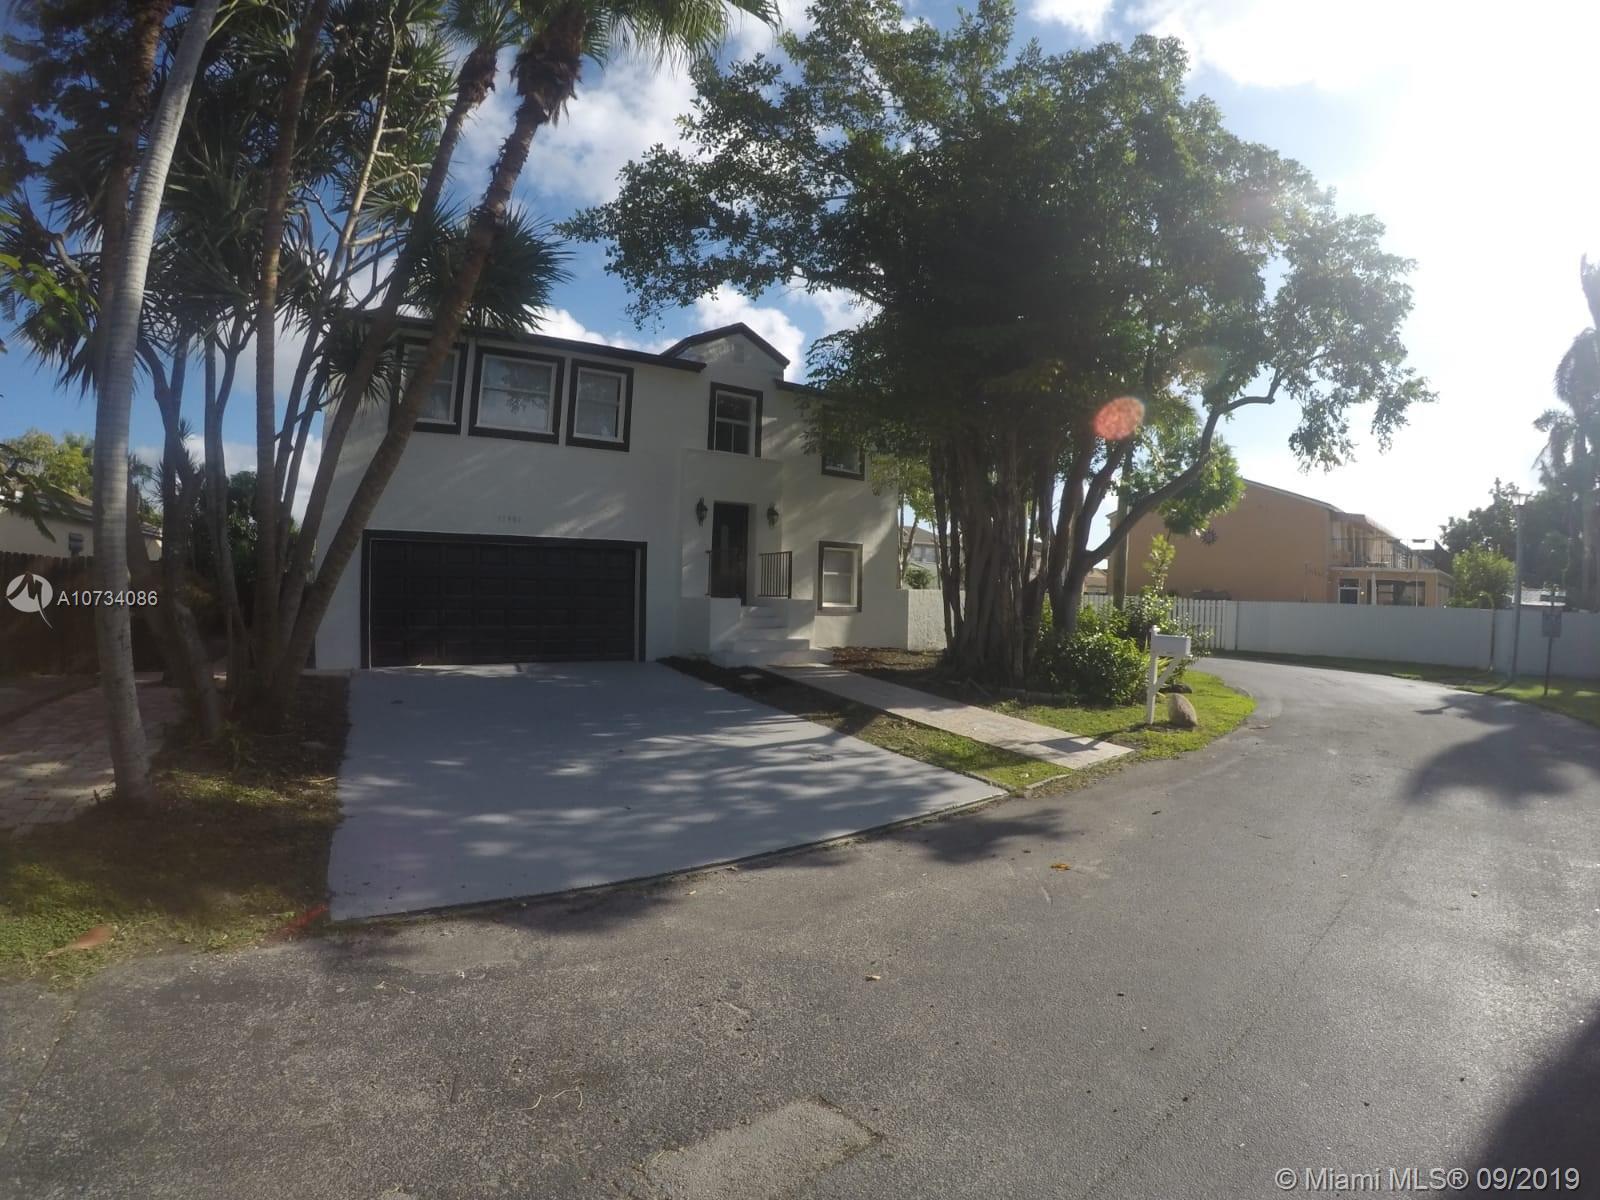 11901 SW 274 ST, Homestead, FL 33032 - Homestead, FL real estate listing